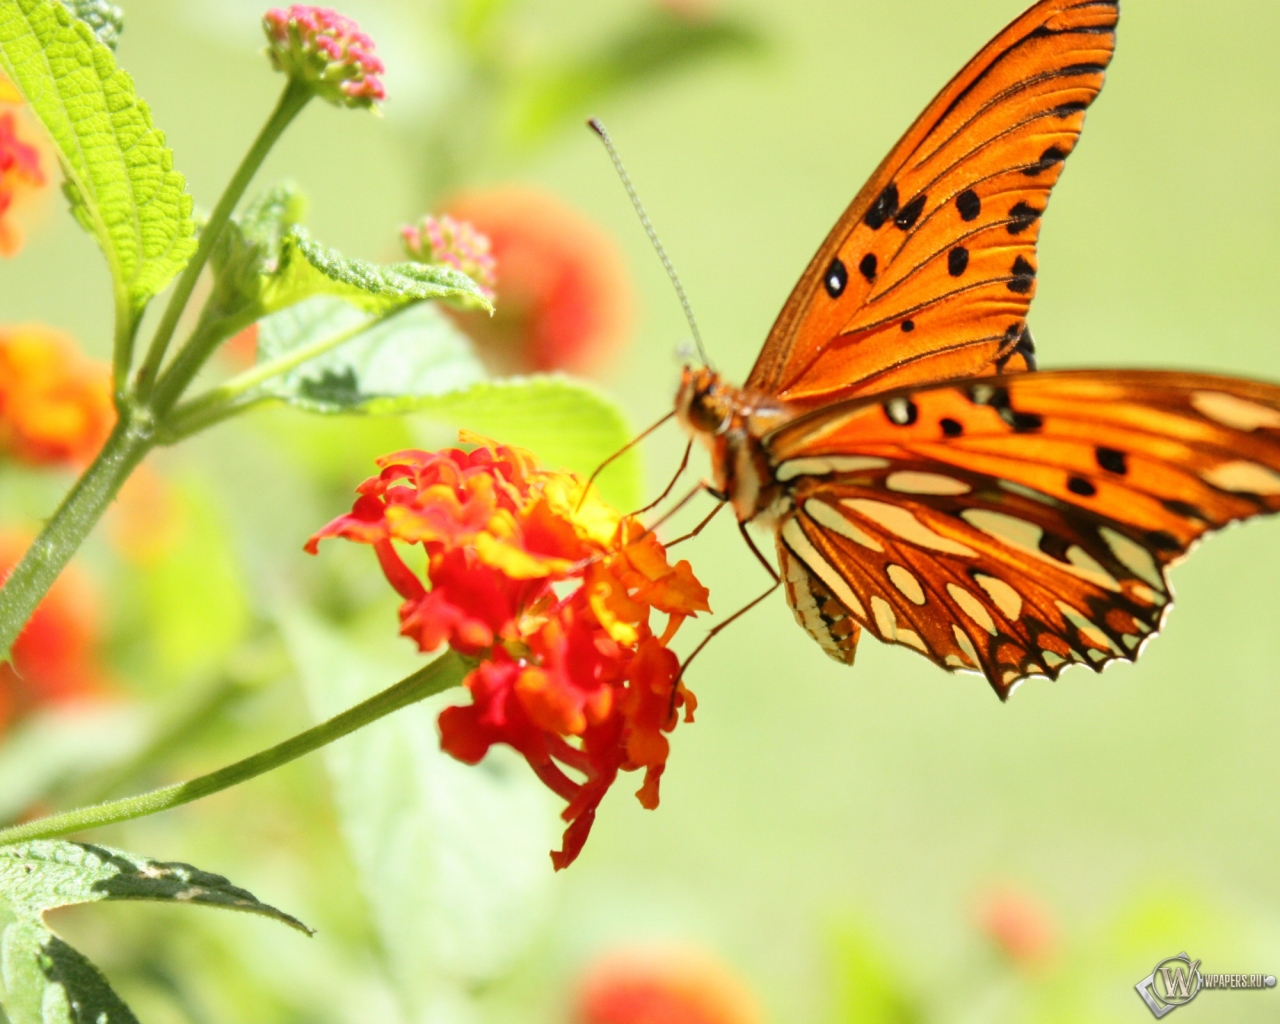 Бабочка на цветке 1280x1024